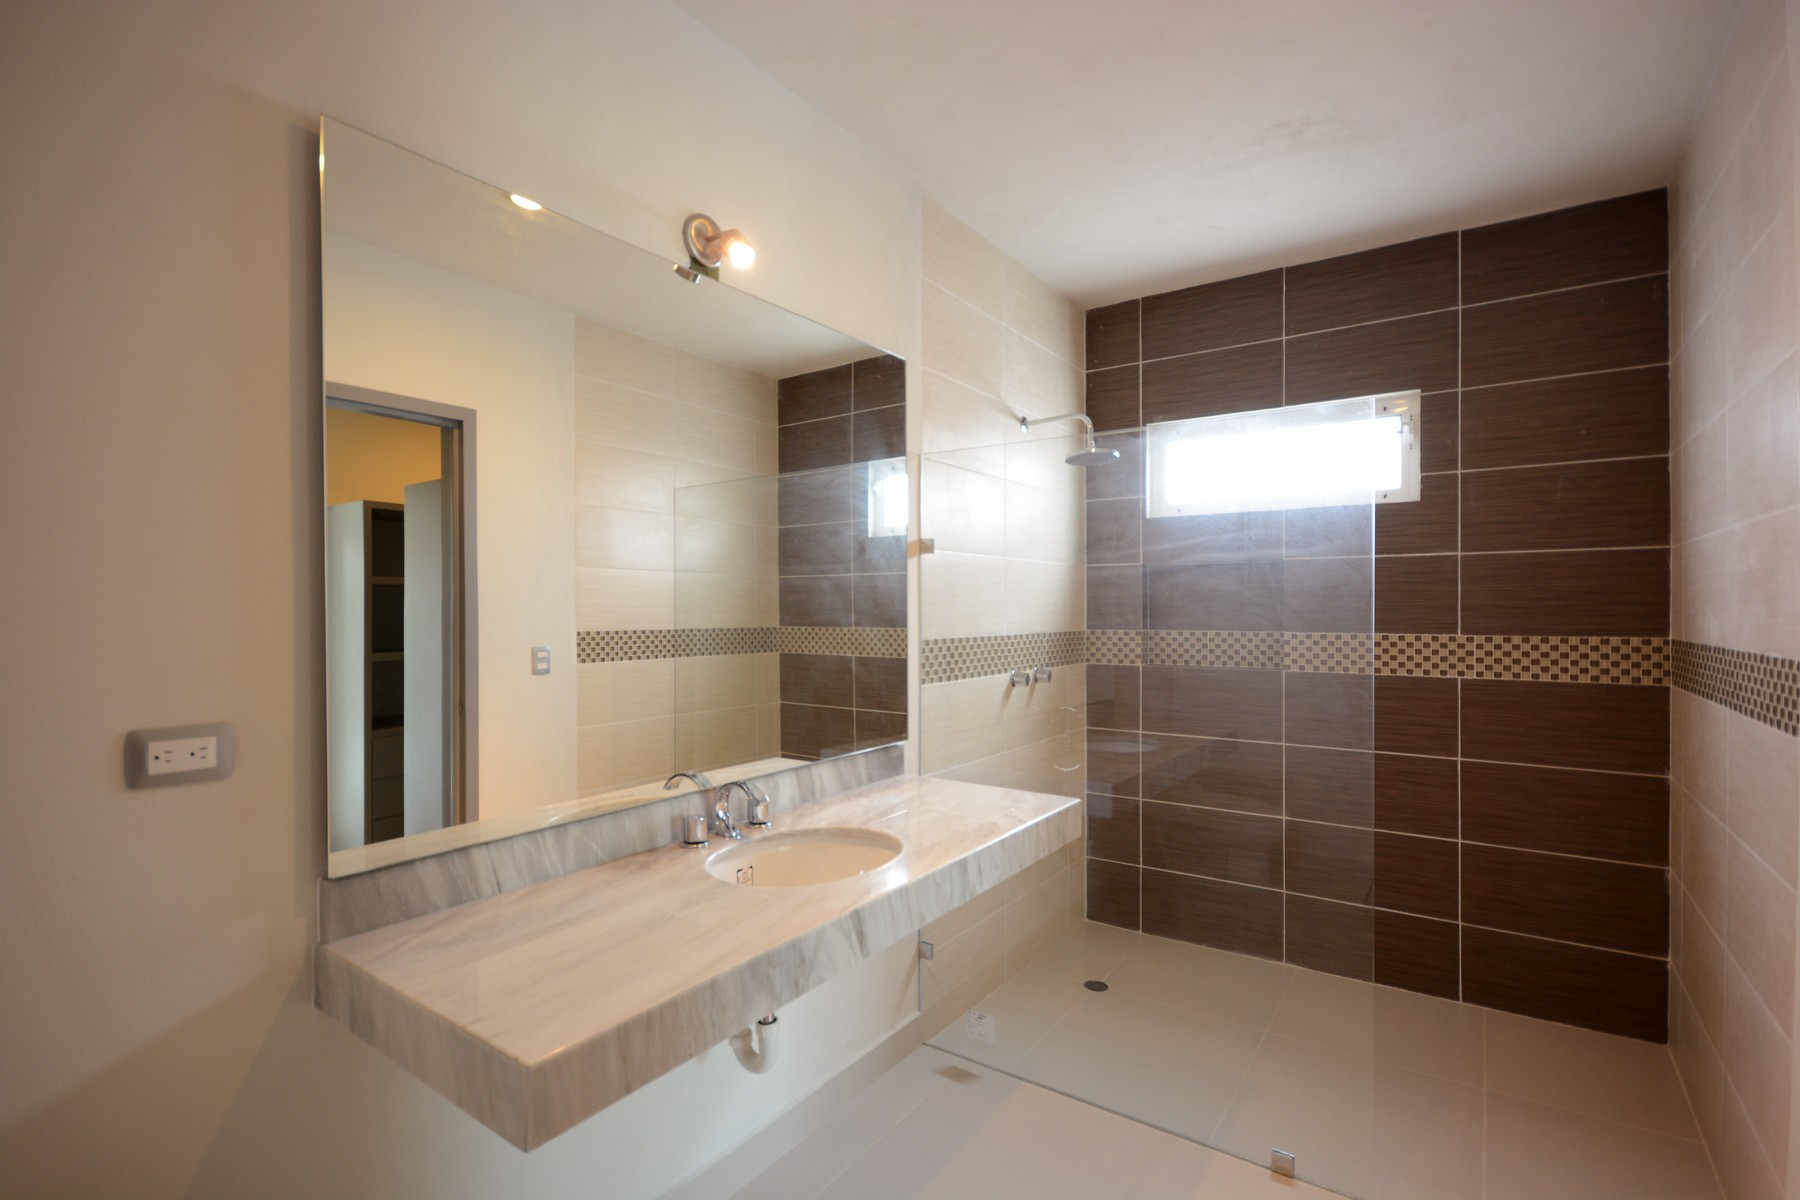 Additional photo for property listing at CASA CONTEMPO Cancun, Quintana Roo México